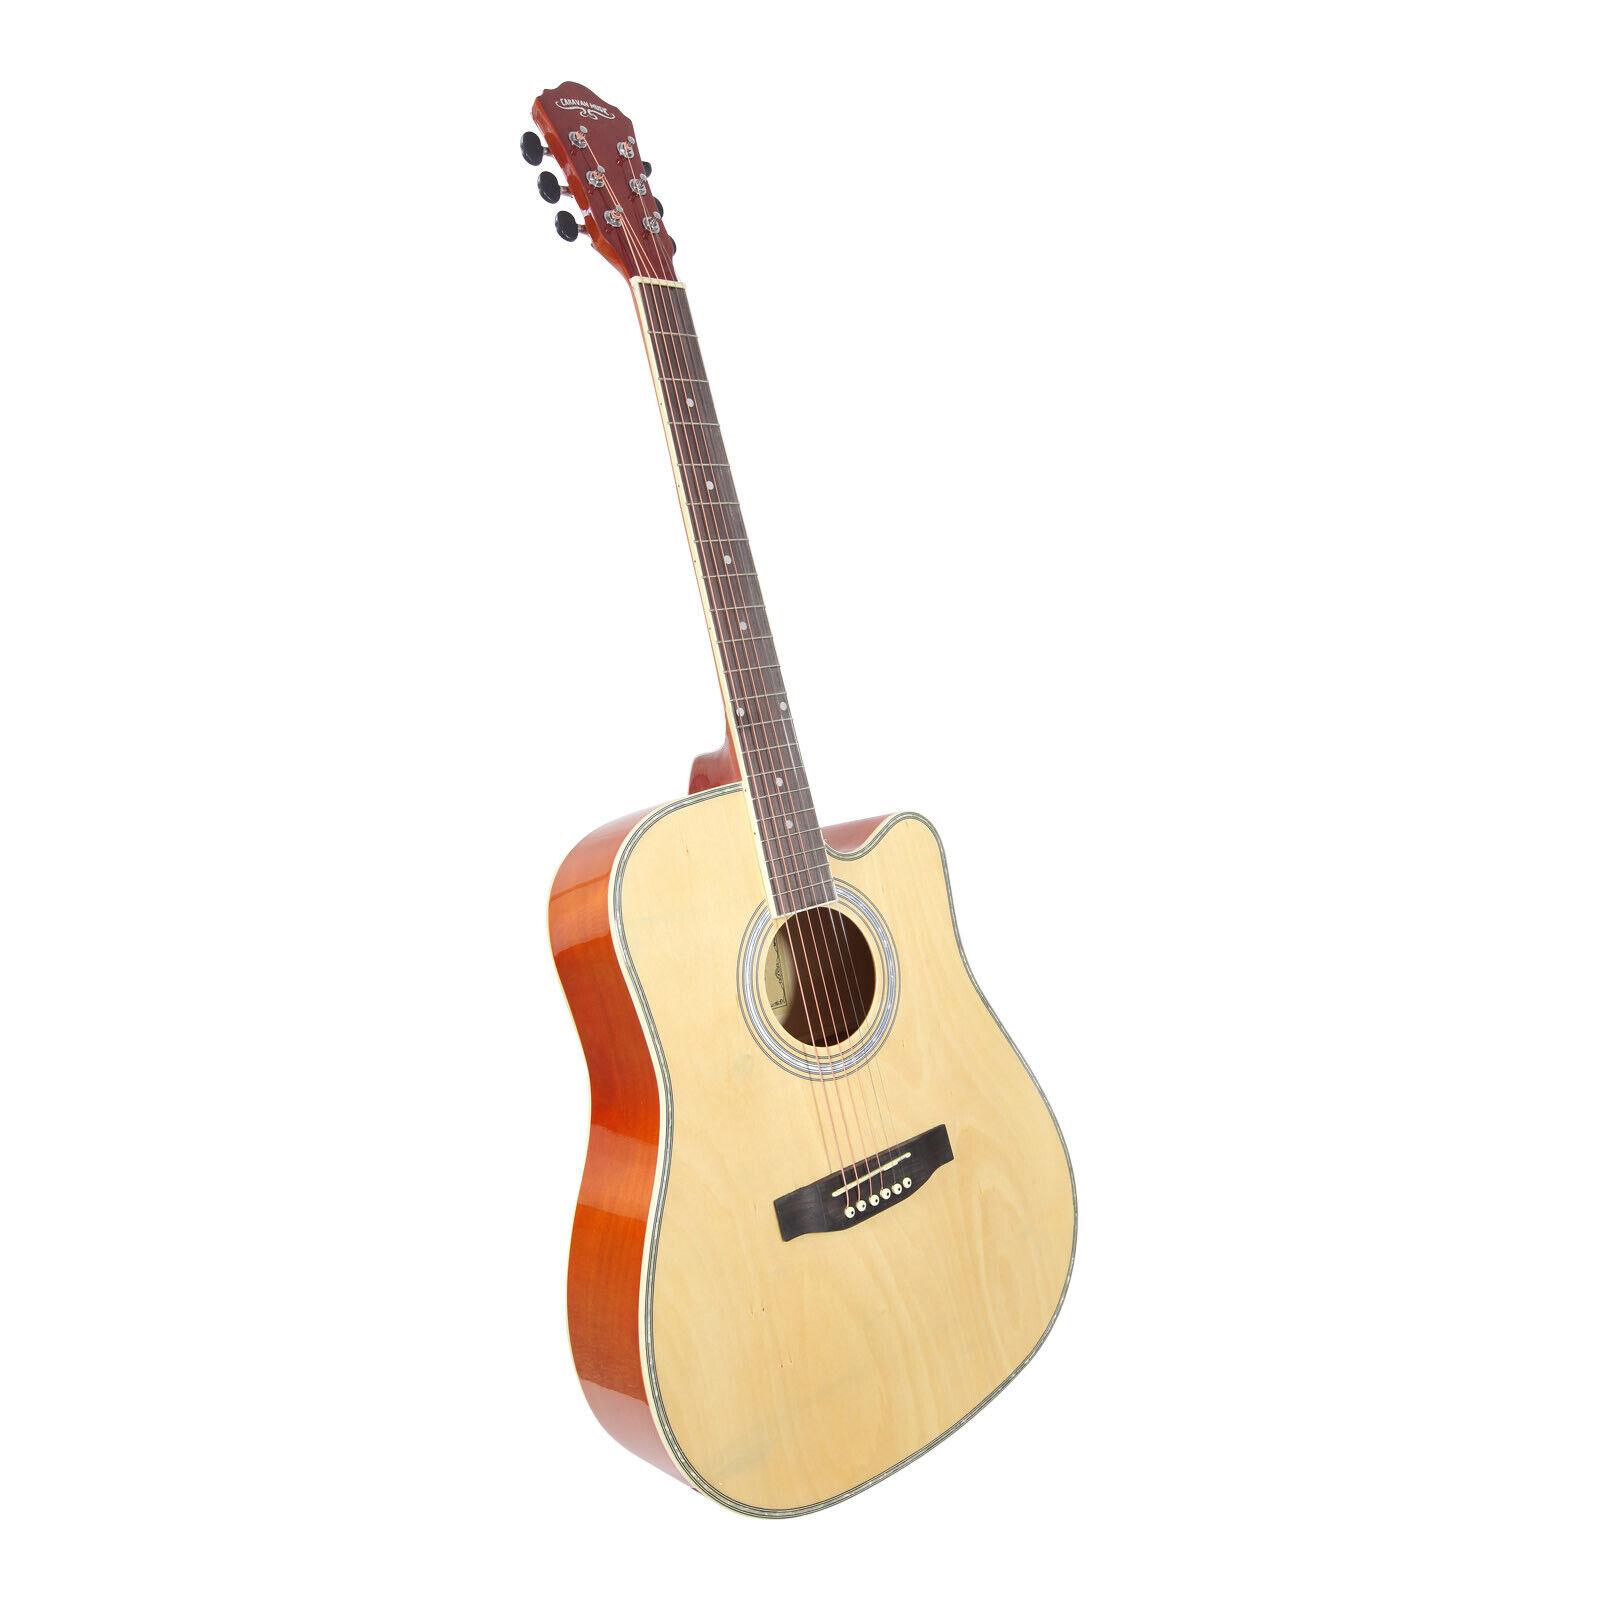 Caravan Music by Acandoo Akustische Gitarre acoustic Westerngitarre Natur finish